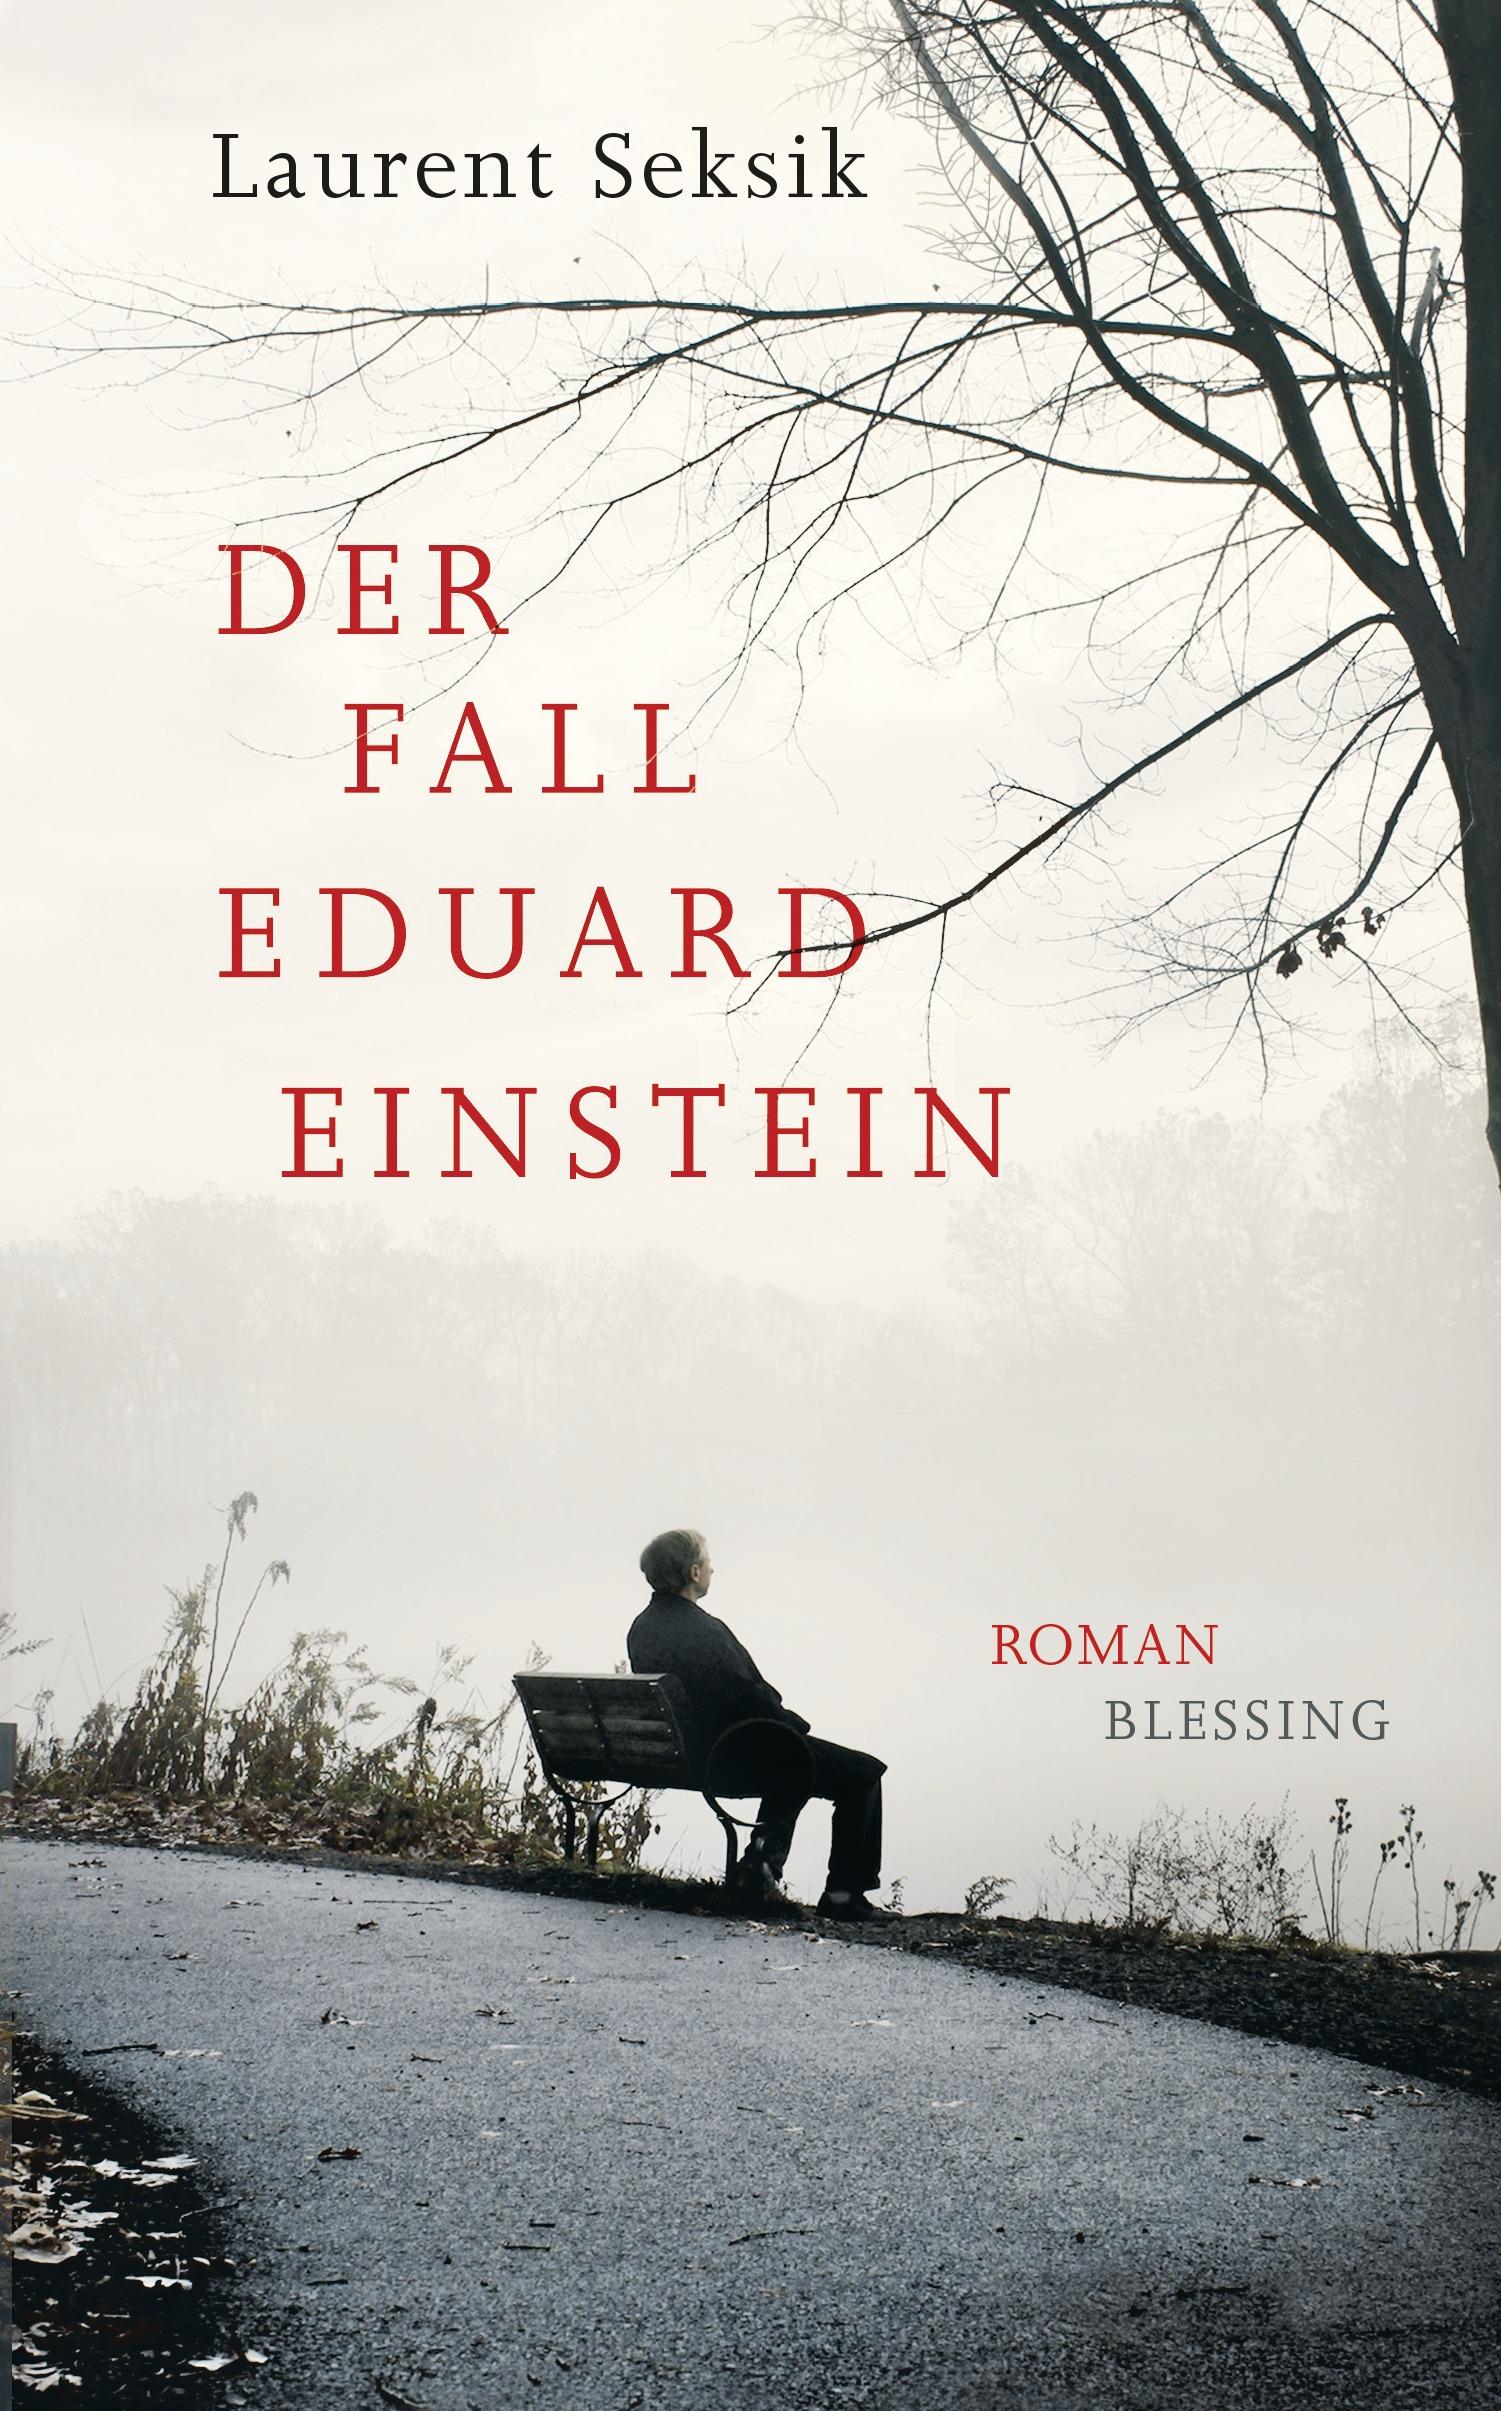 Der Fall Eduard Einstein - Laurent Seksik